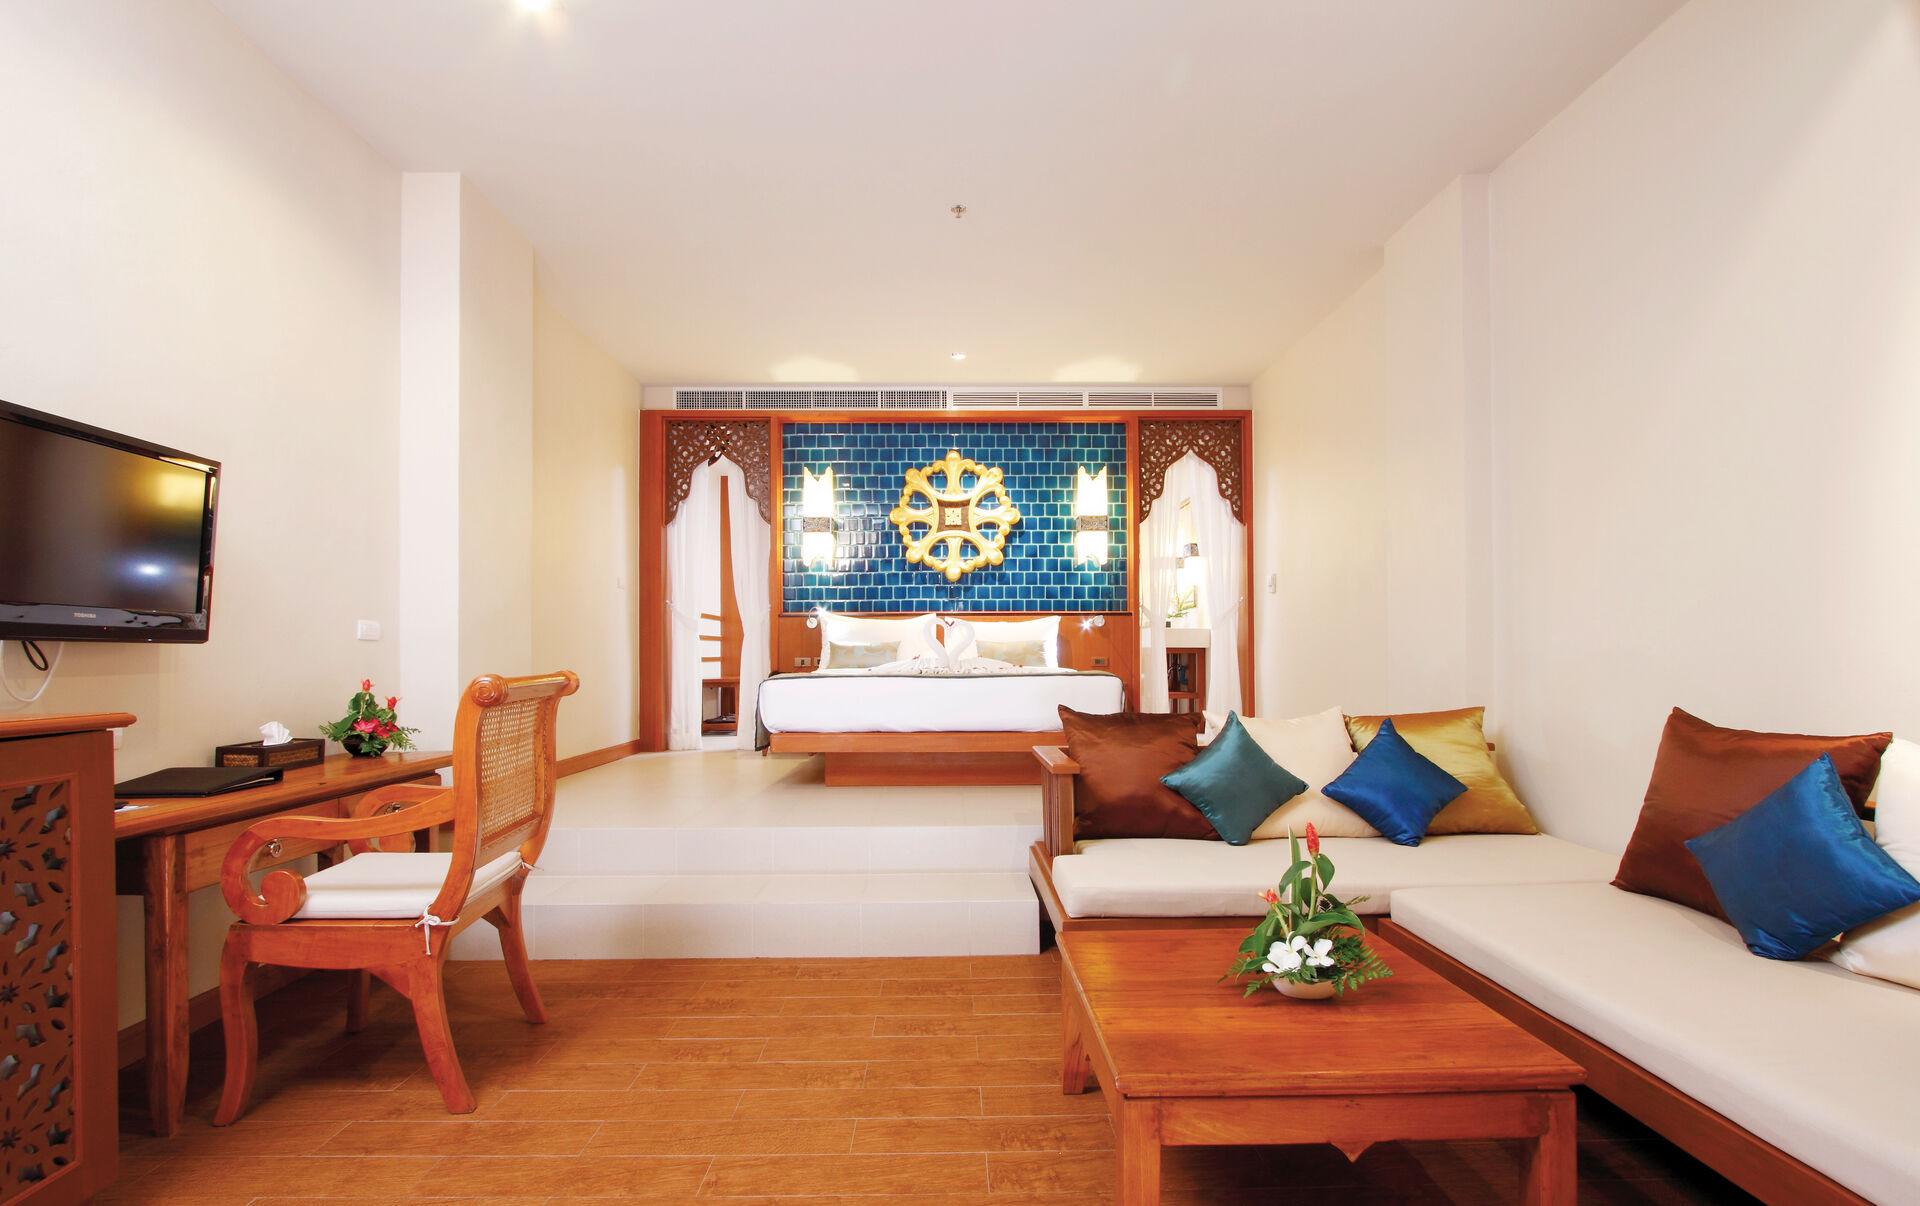 Thaïlande - Phuket - Rawai - Hôtel Rawai Palm Beach Resort 4*